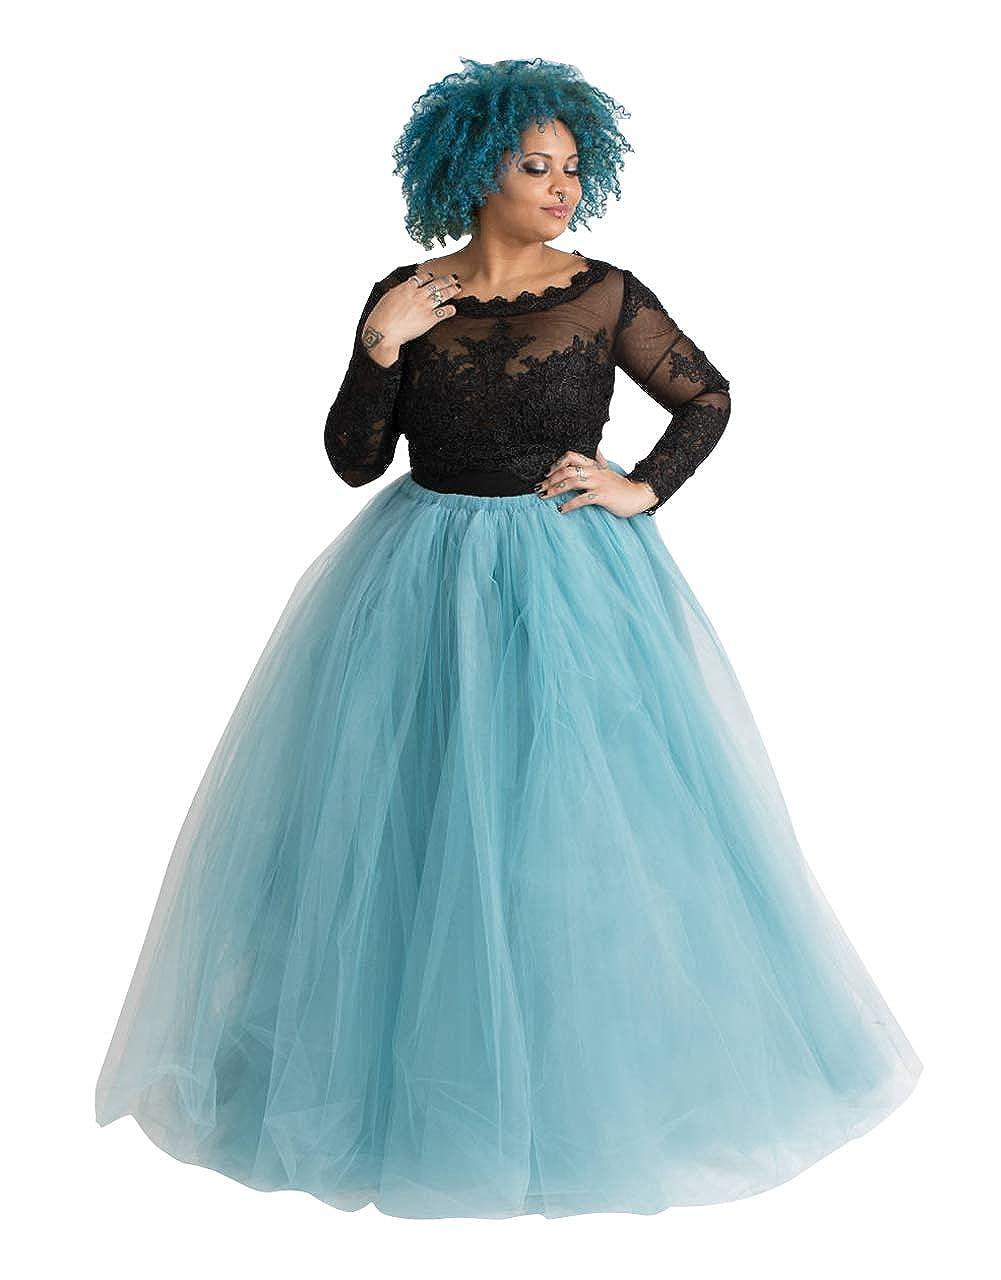 Flowerry Fluffy and Long Adult Tutu Tulle Skirt Bridesmaid Skirt Maxi Skirt Prom Skirt Ball Skirt (4XL, Egyptian bluee)